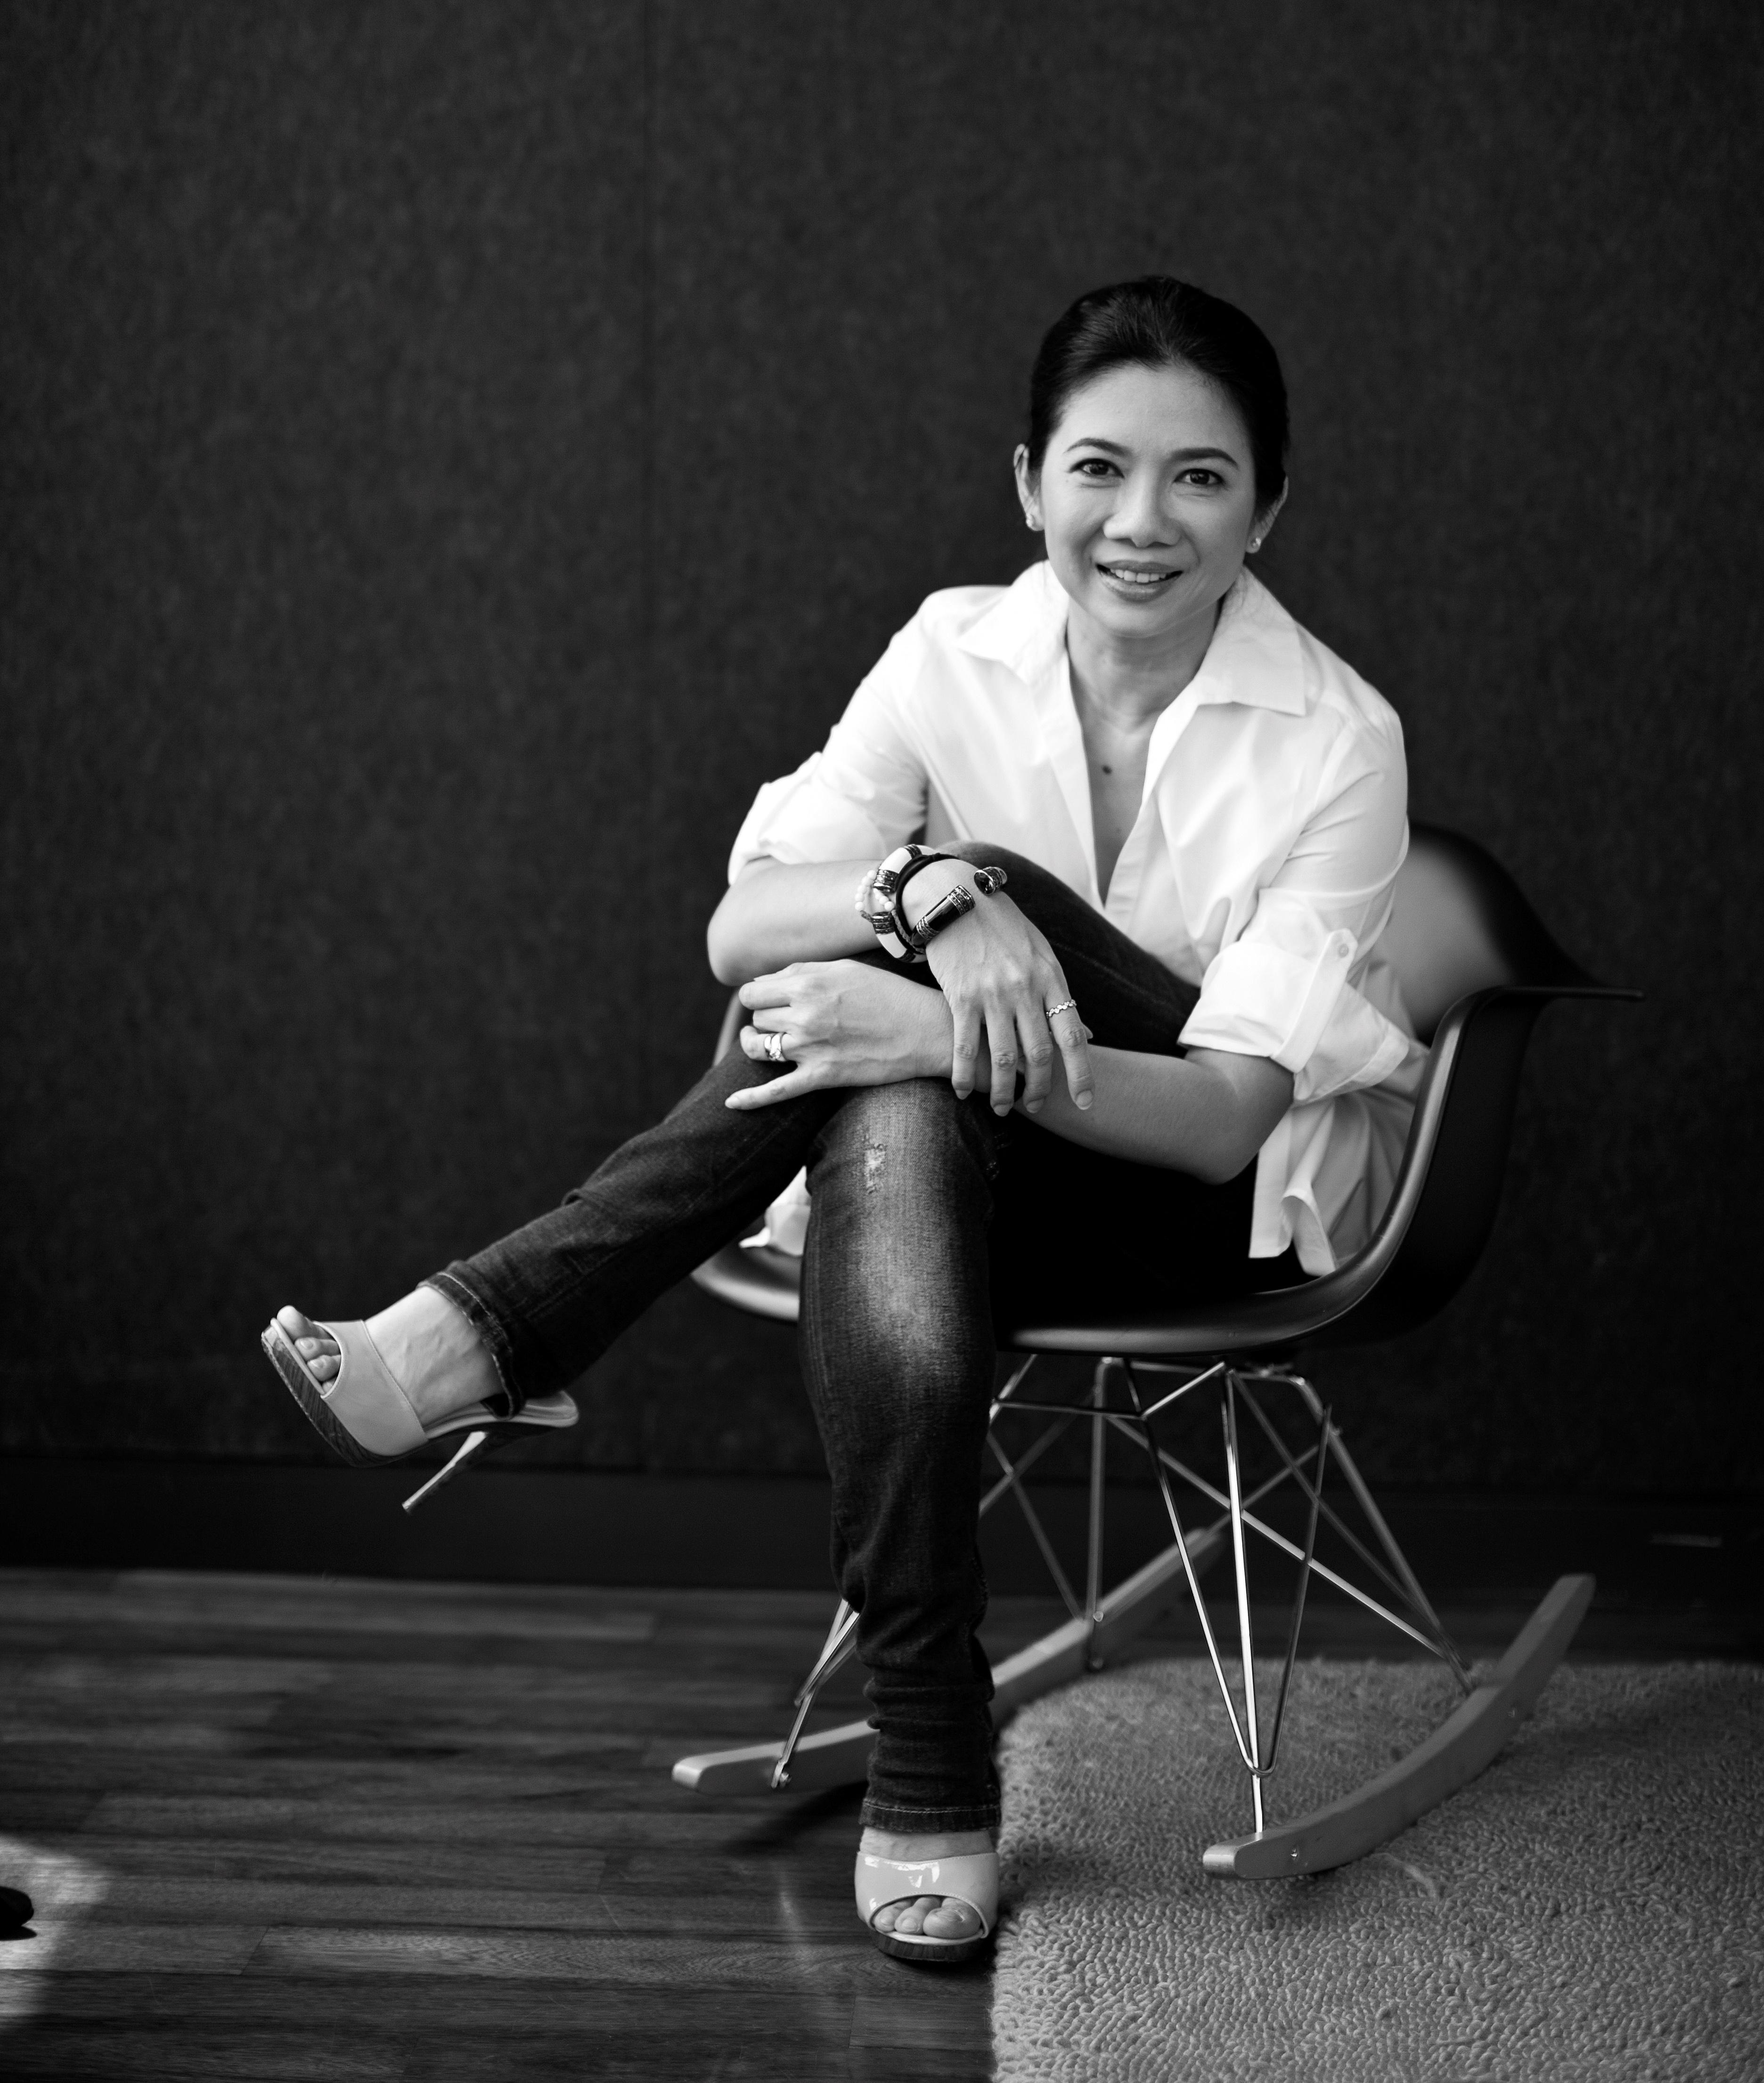 Miss Tanya Suvannapong